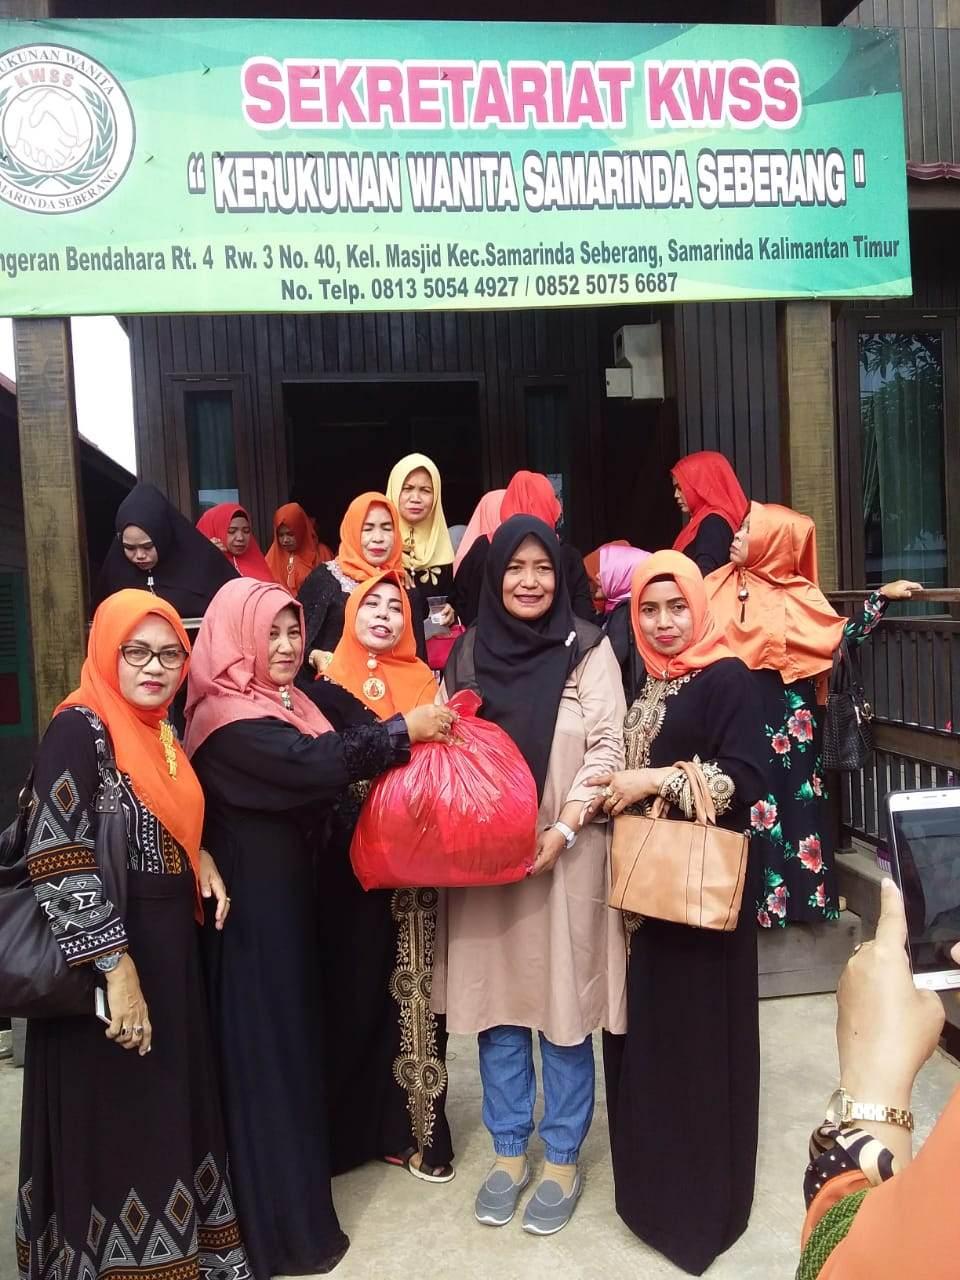 KWSS ( Kerukunan Wanita Samarinda Seberang ) Peduli Korban Gempa & Tsunami Palu Sulteng, Beri Bantuan Pengungsi Di Samarinda